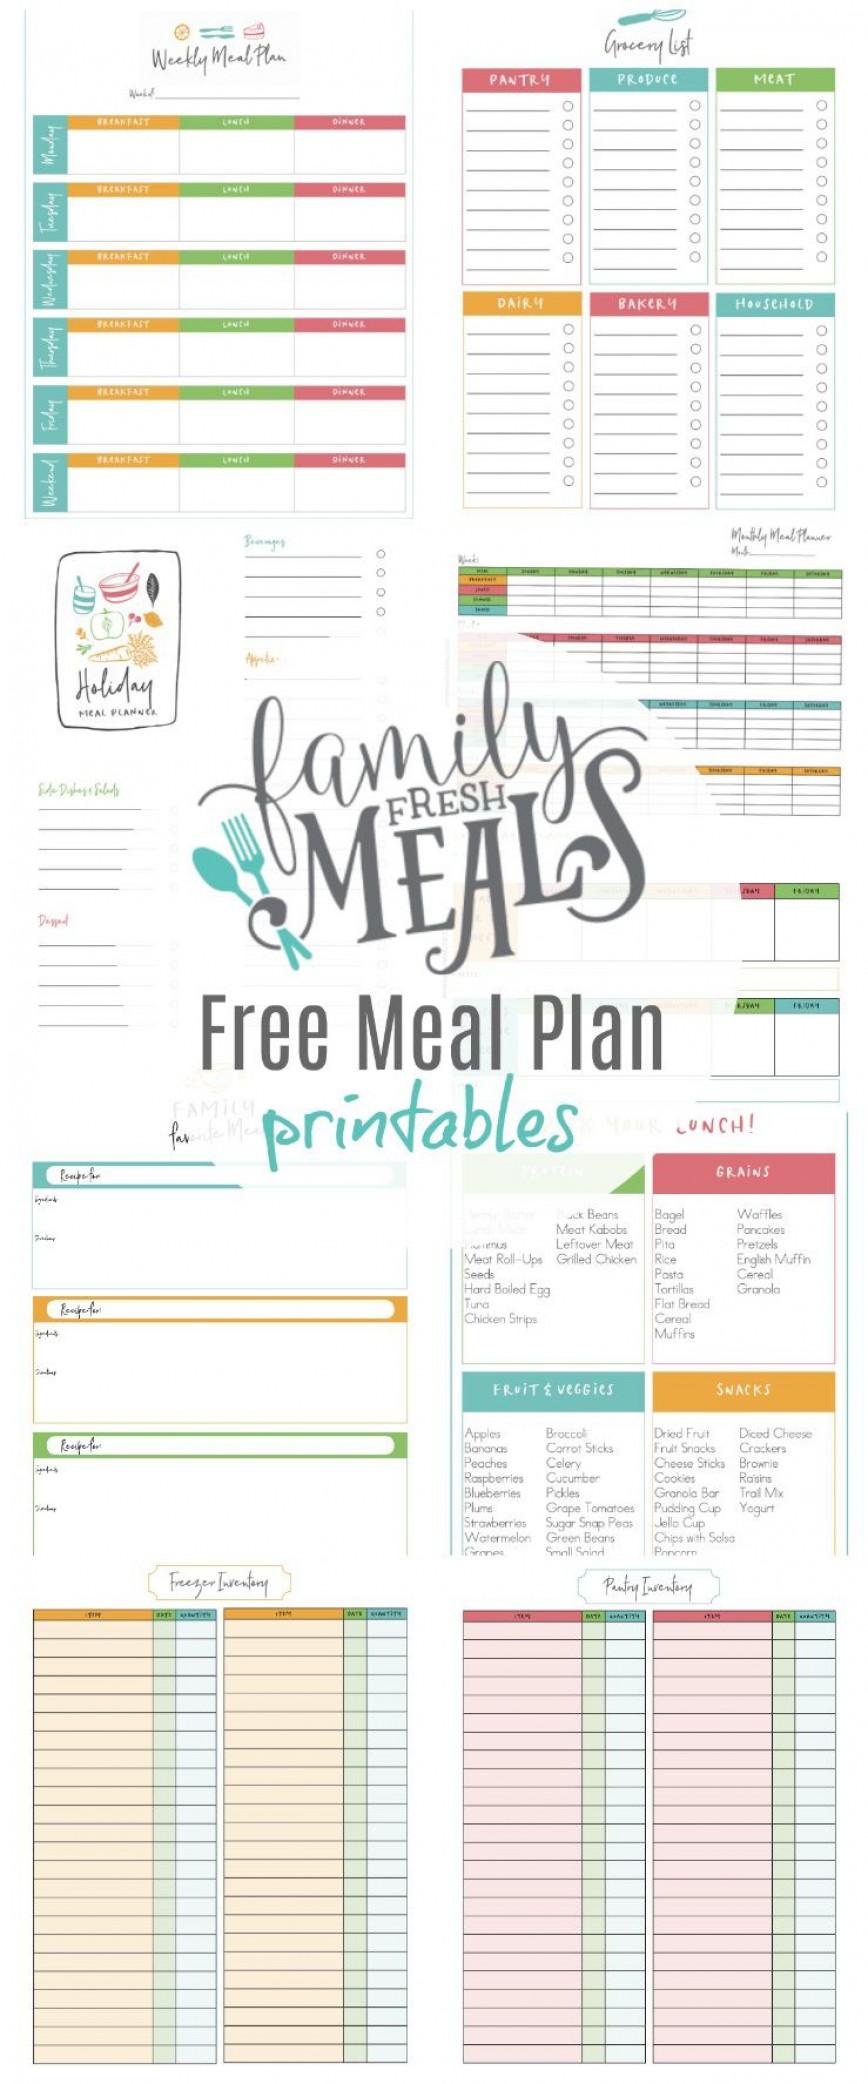 003 Unbelievable Meal Plan Printable Pdf Photo  Worksheet Downloadable Template Sheet868